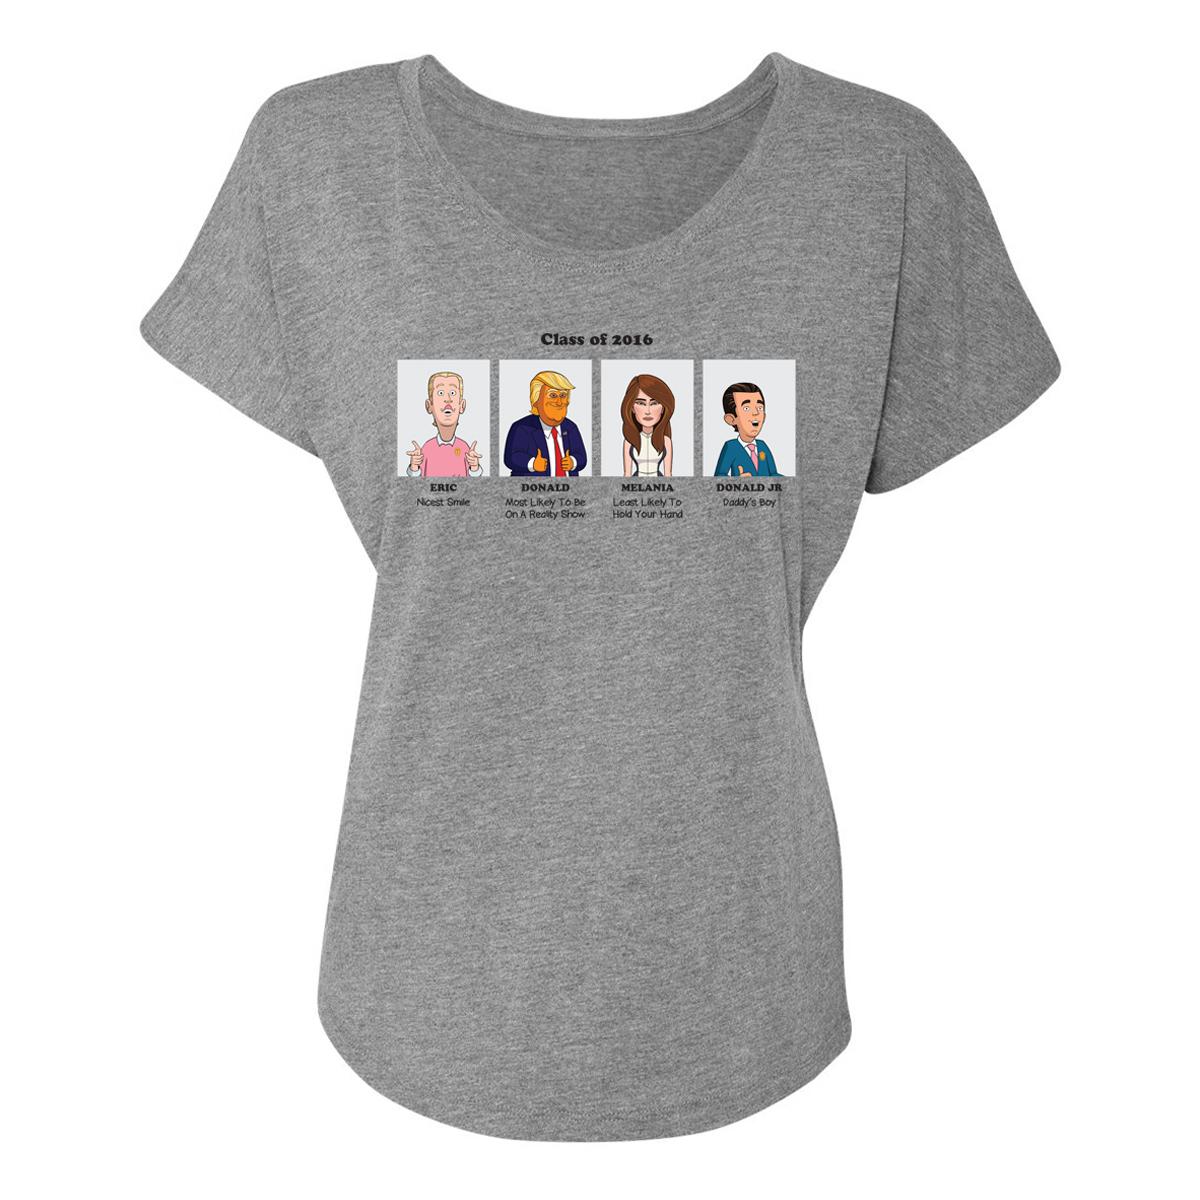 Our Cartoon President Yearbook Superlatives Women's Dolman T-Shirt